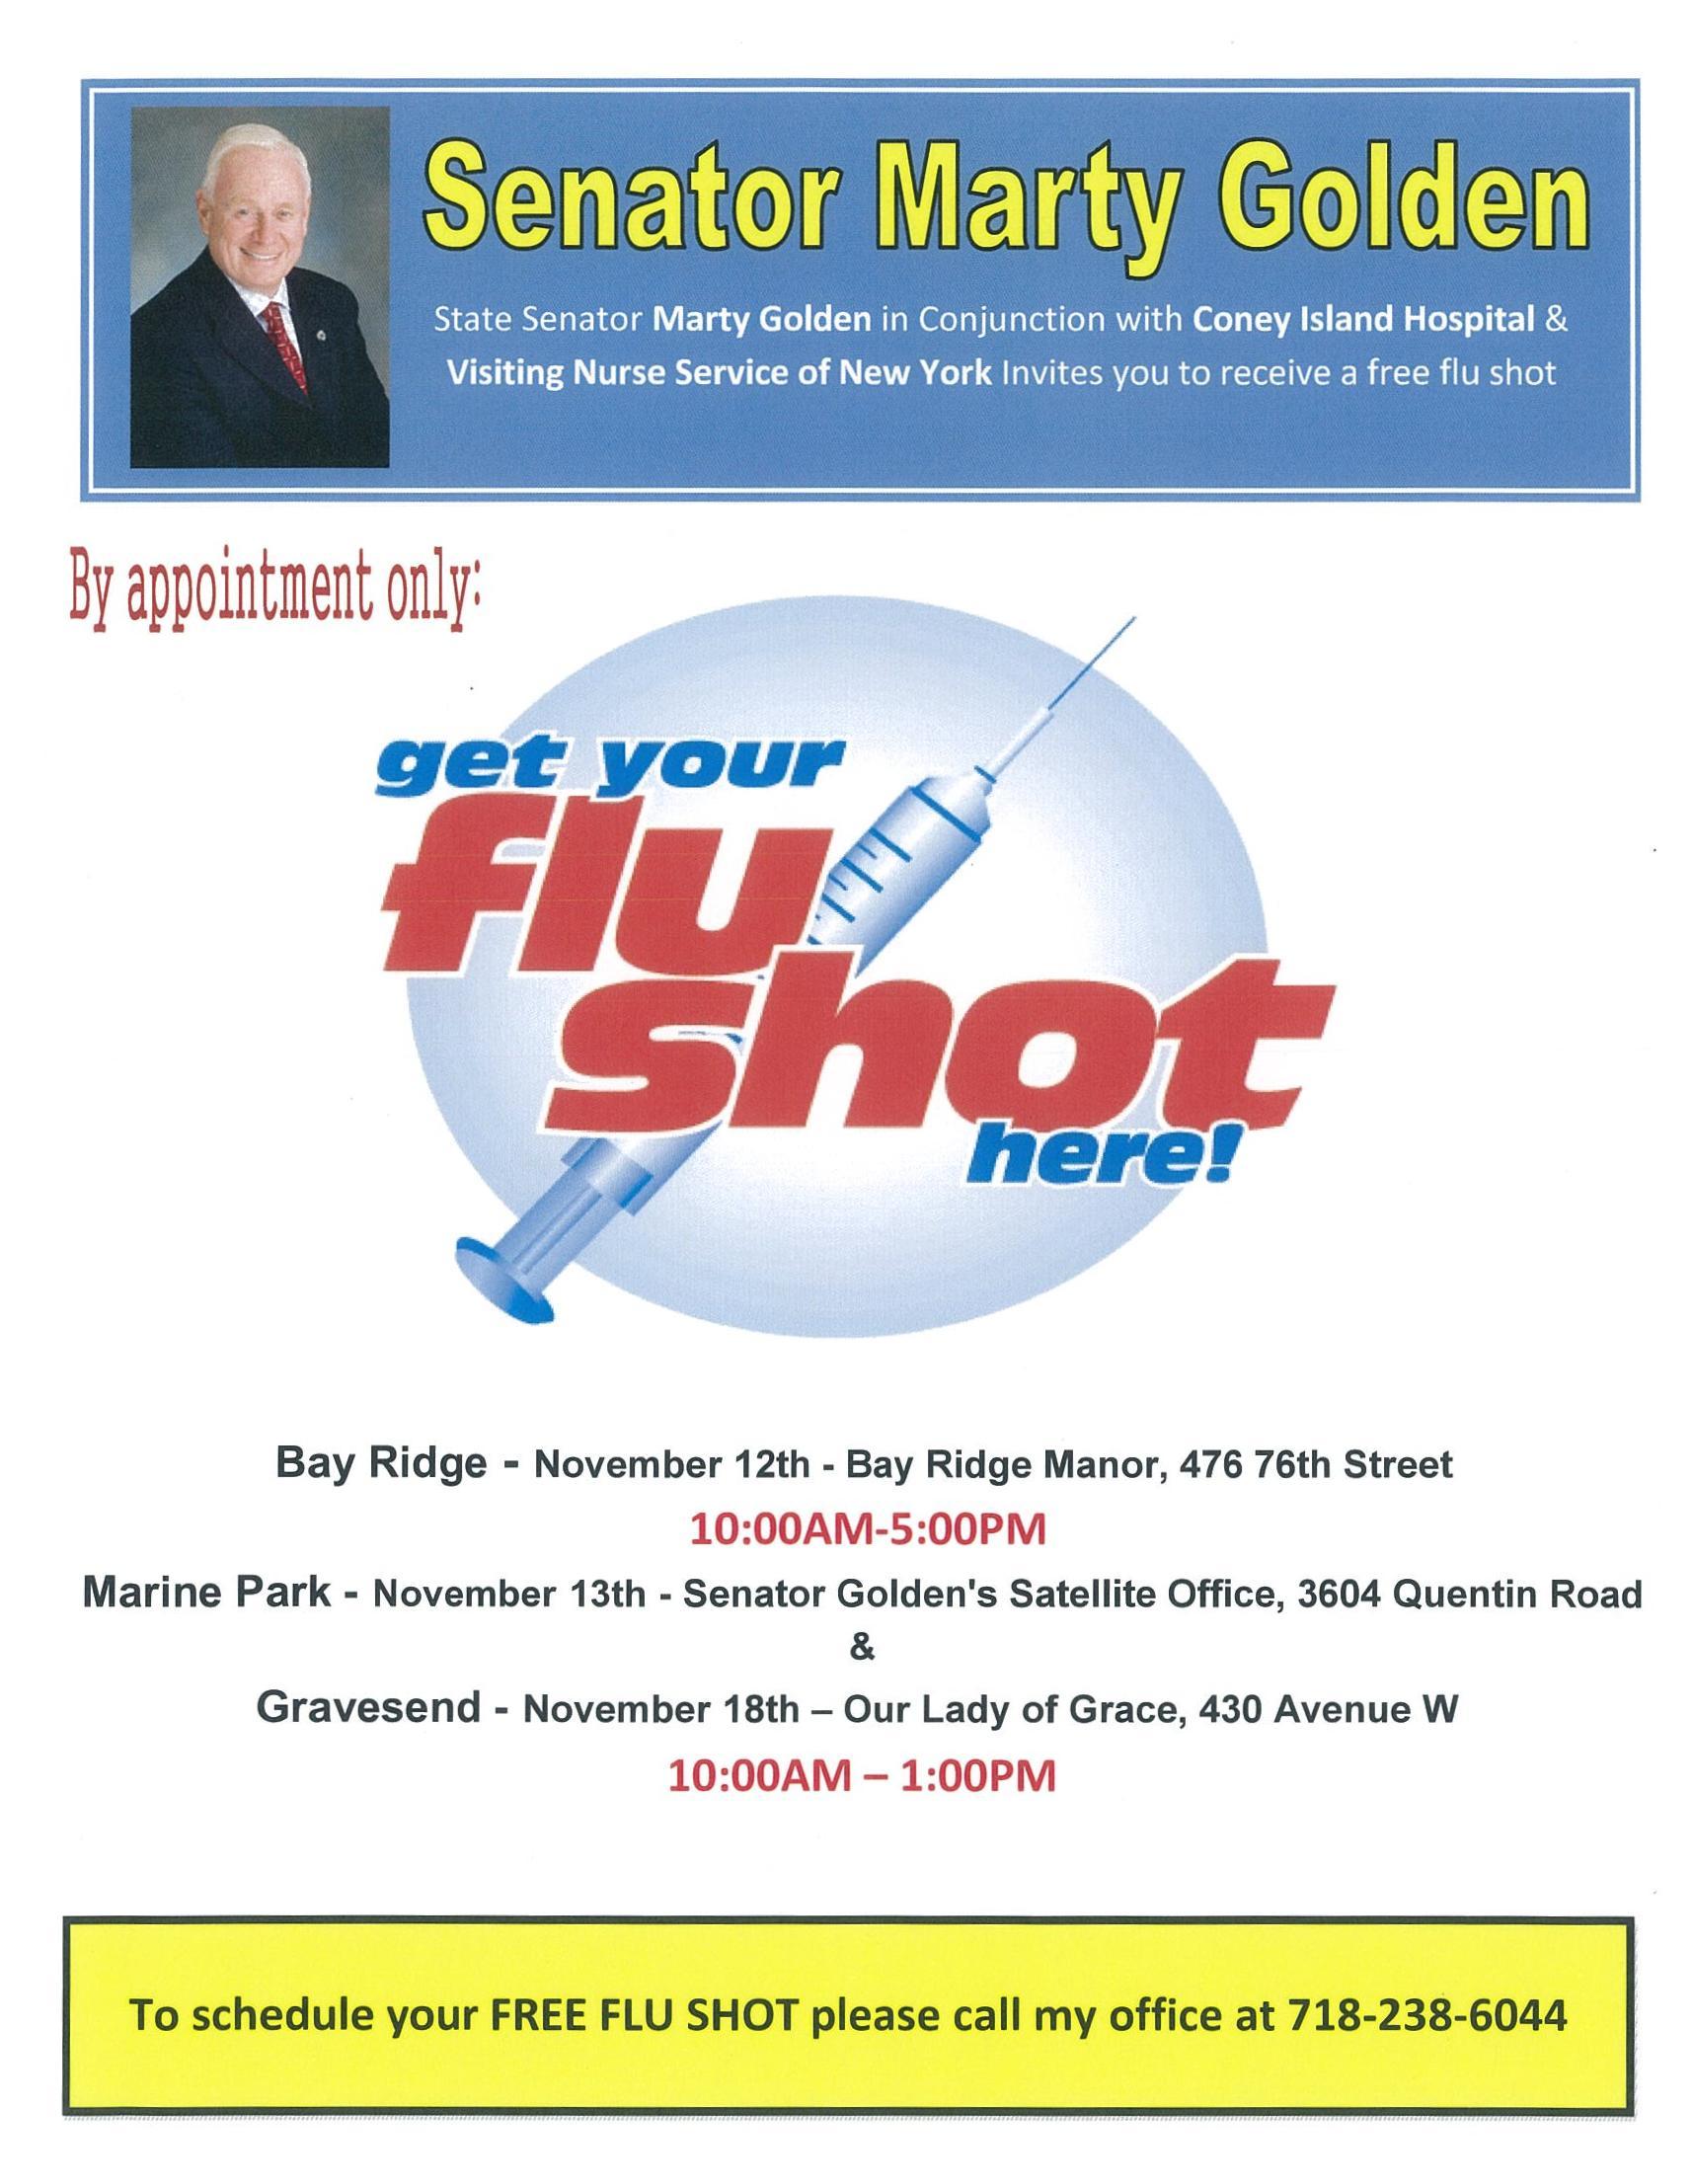 SENATOR GOLDEN SPONSORING FREE FLU SHOTS  BAY RIDGE  NY State Senate